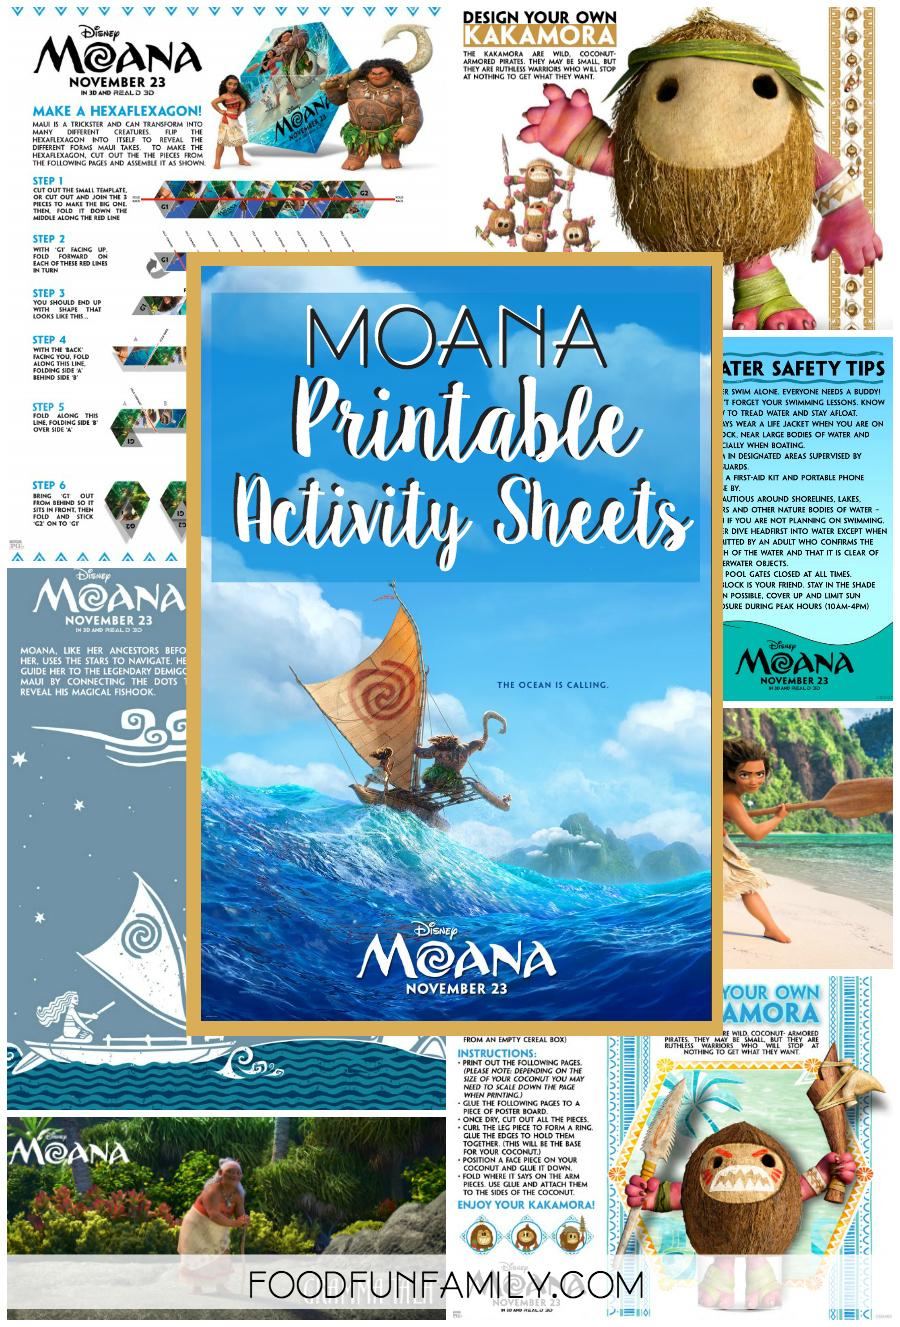 Moana printable activity sheets from Food Fun Family